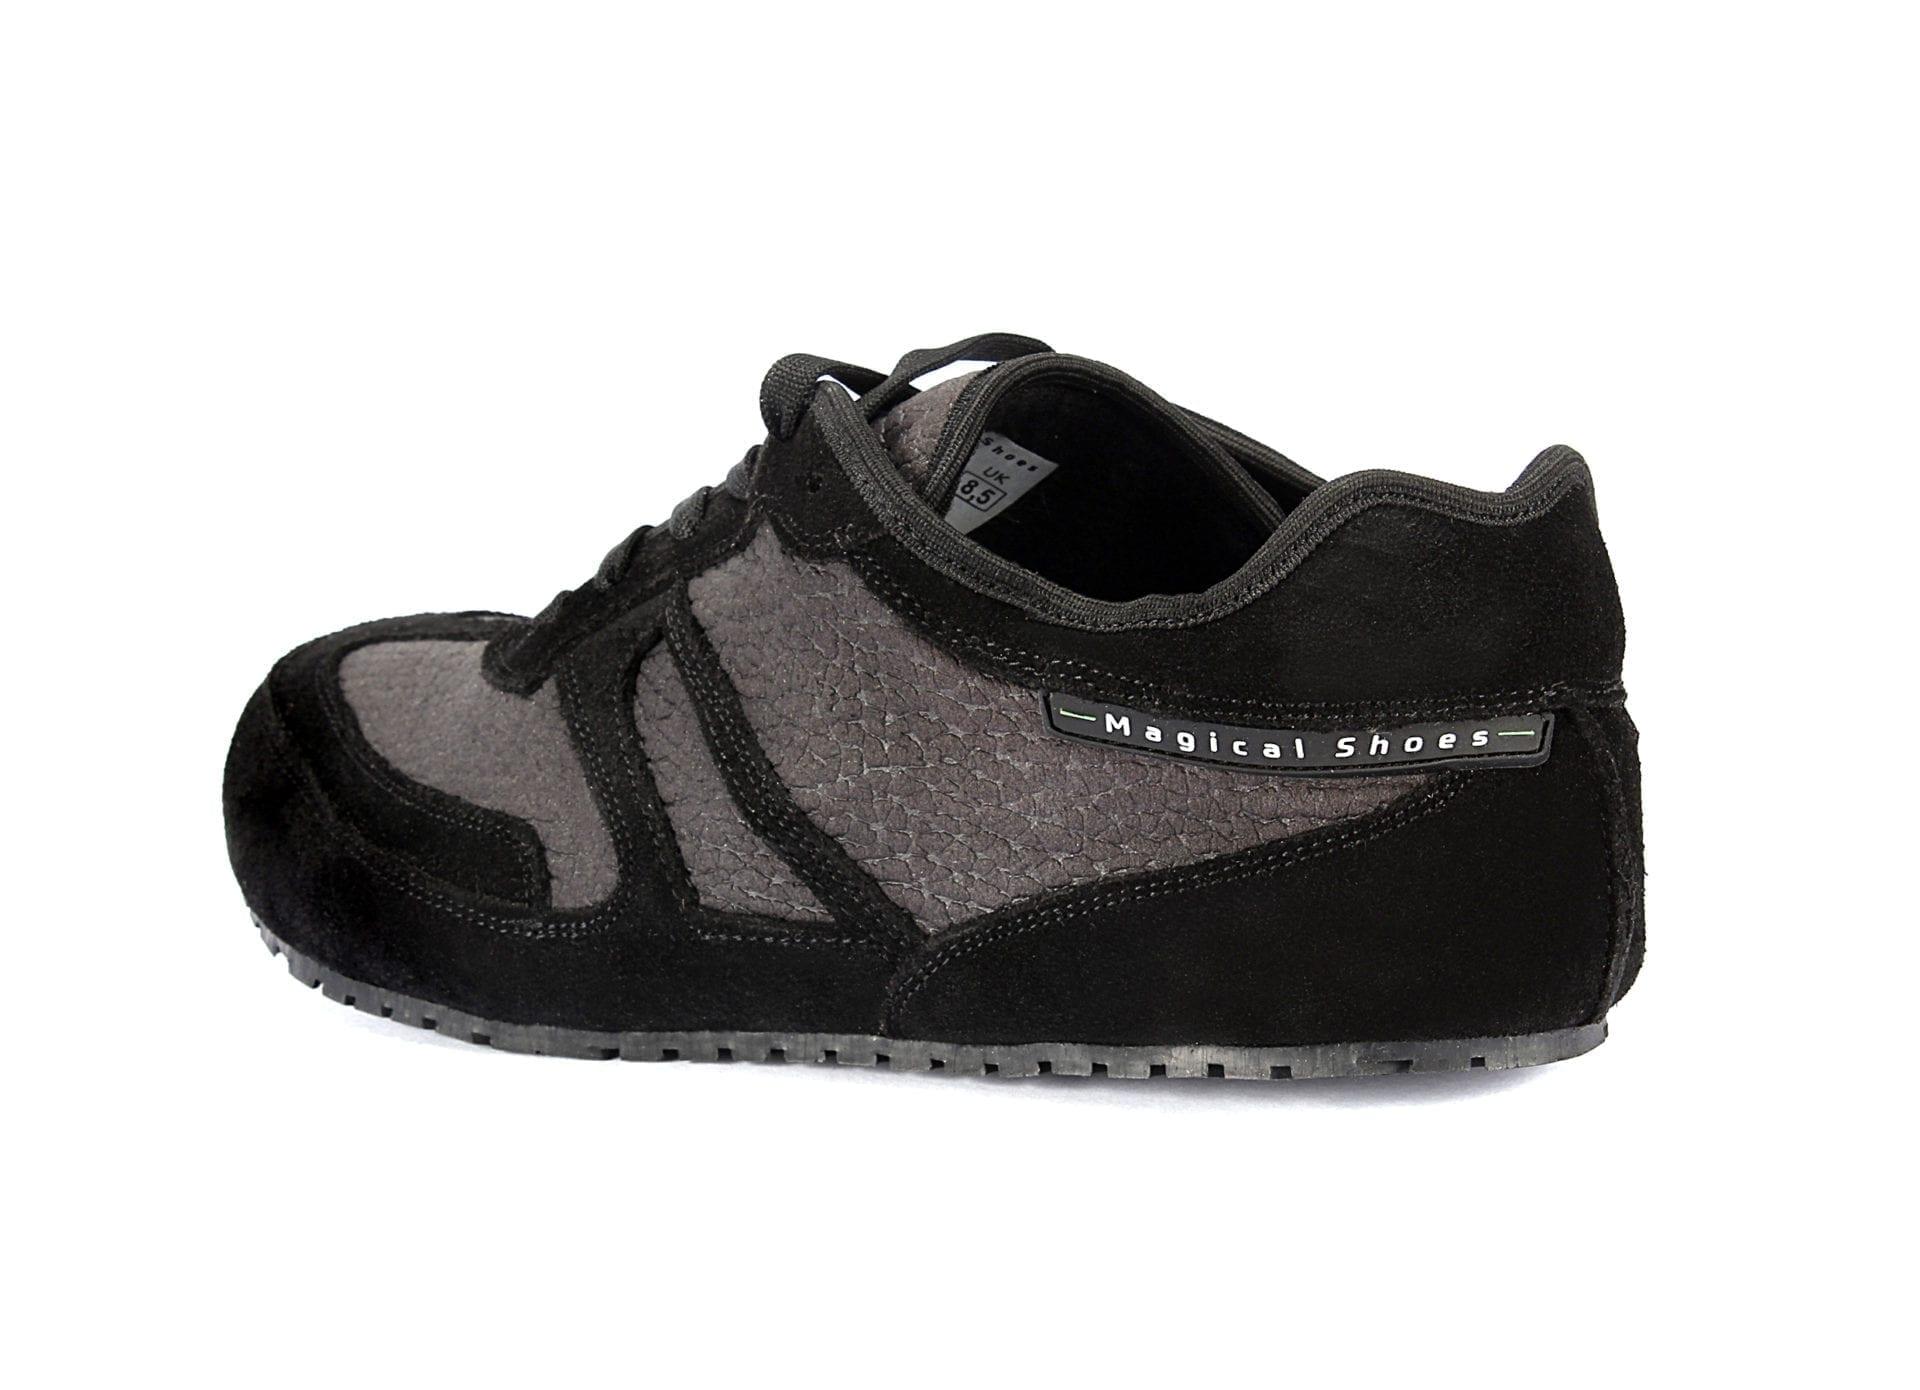 Magical Shoes BAREFOOT SHOES EXPLORER AUTUMN BARIBAL KIDS picture 3